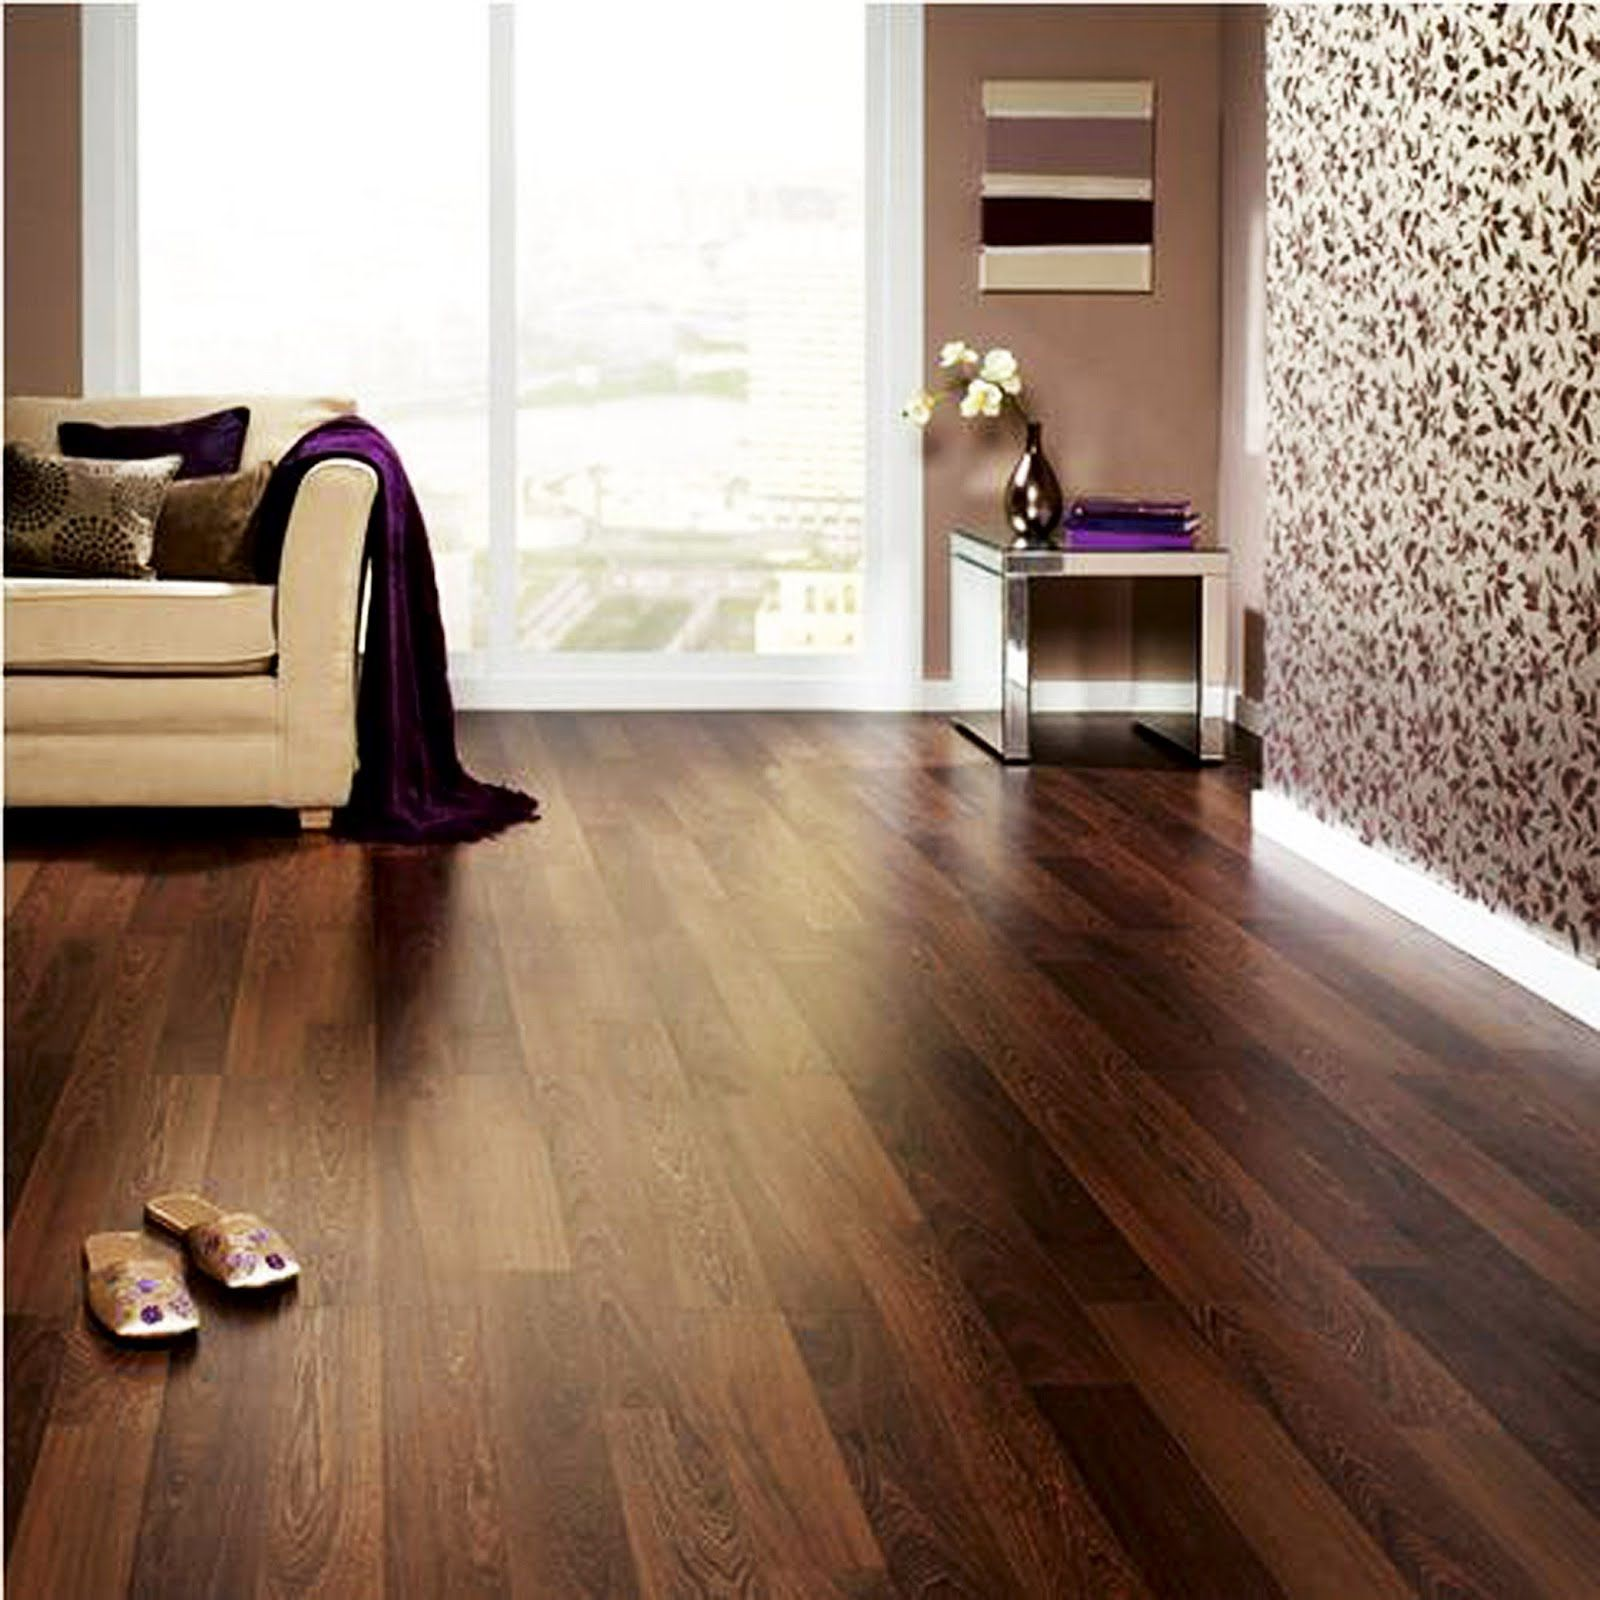 Engineered Flooring Marken Engineered Flooring Marken Wenn Man Bedenkt Home Interieur Dekorieren Es Ist Wir Diseno De Sala Comedor Disenos De Salas Pisos